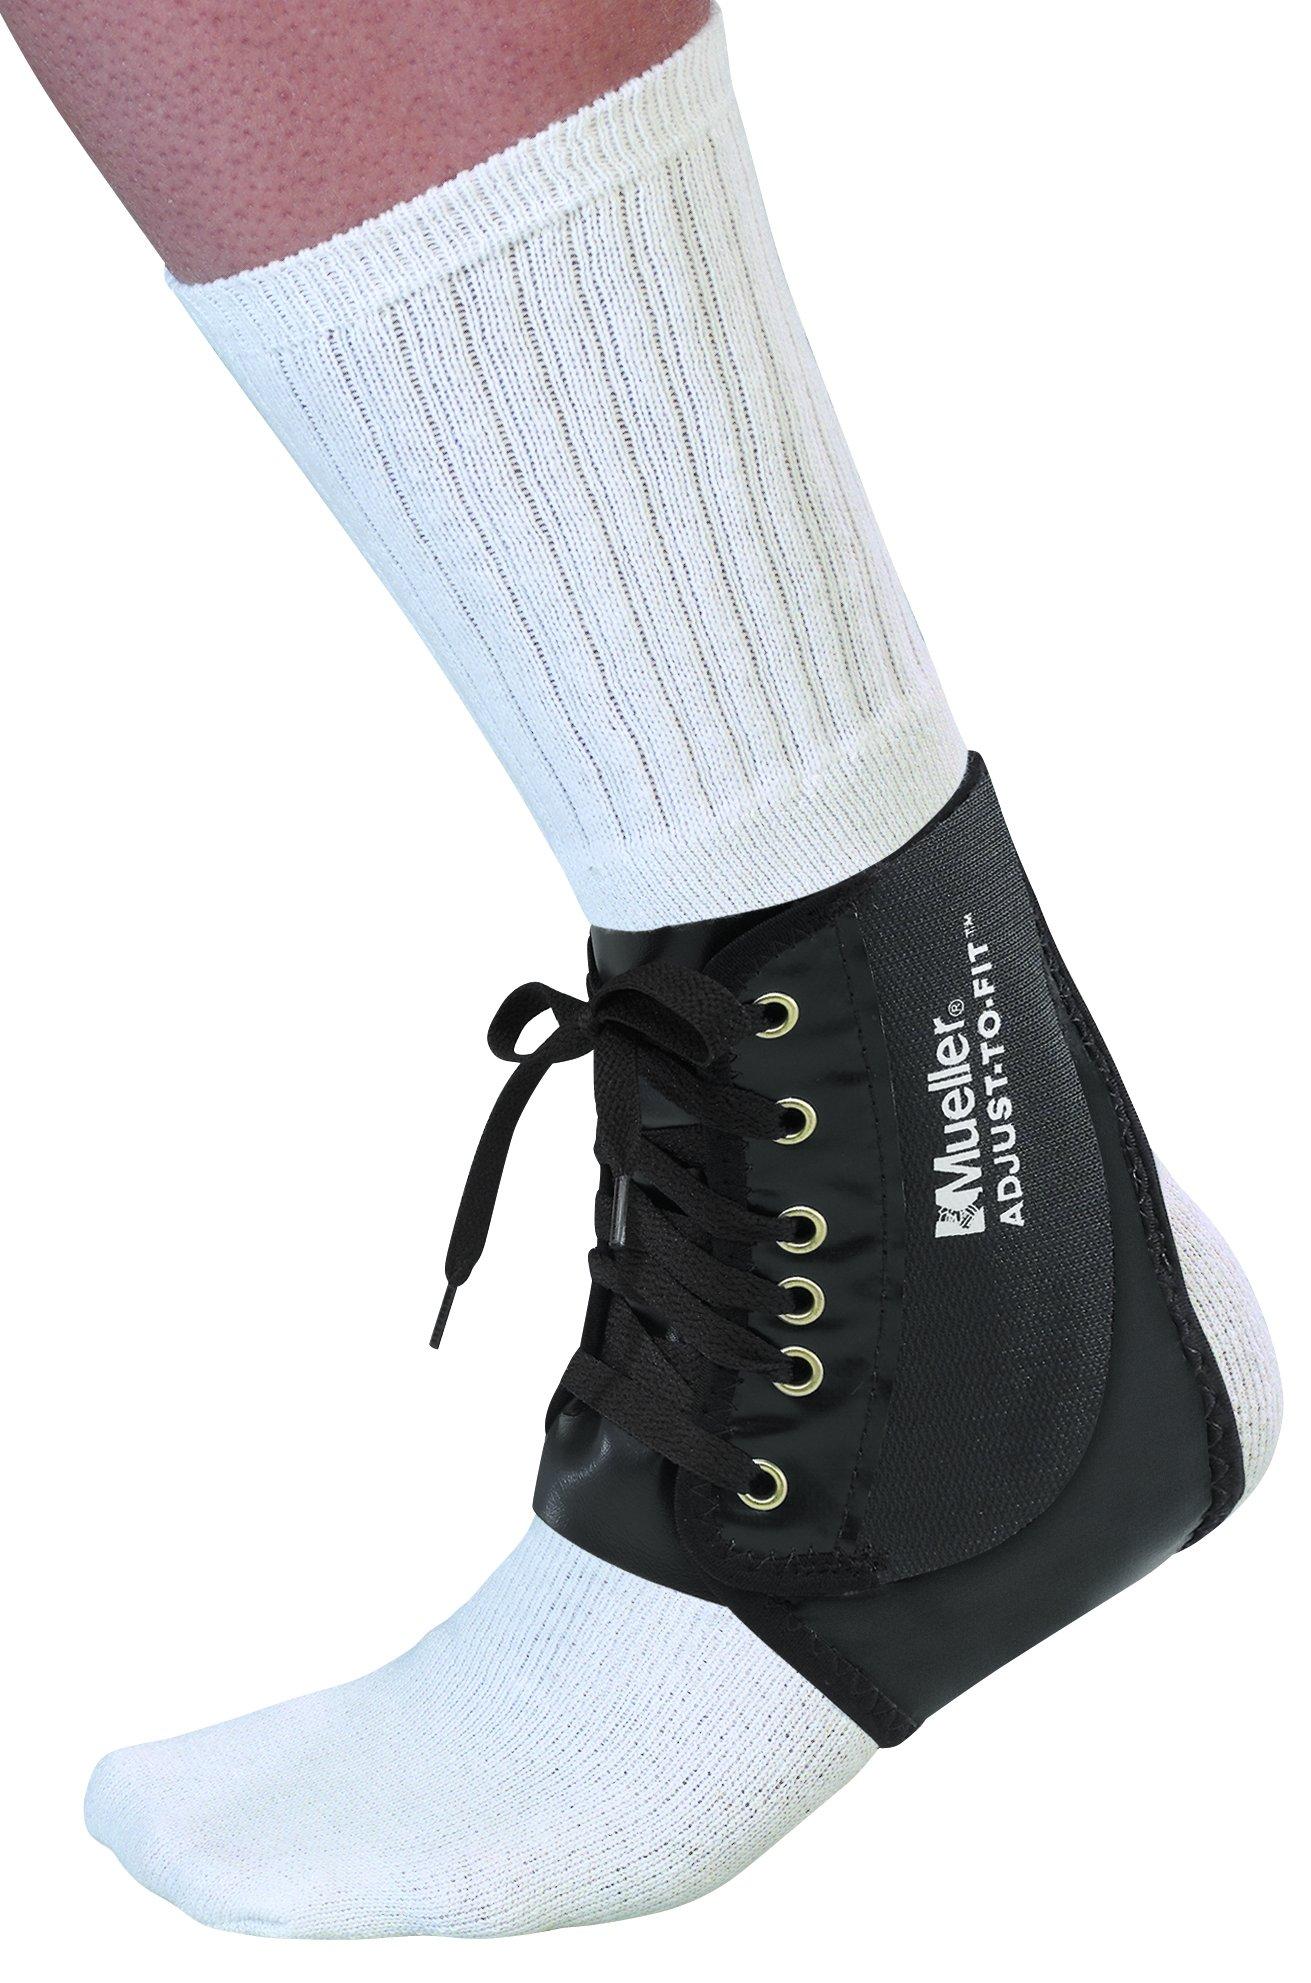 Mueller Adjust-to-fit Ankle Brace, Black, One Size